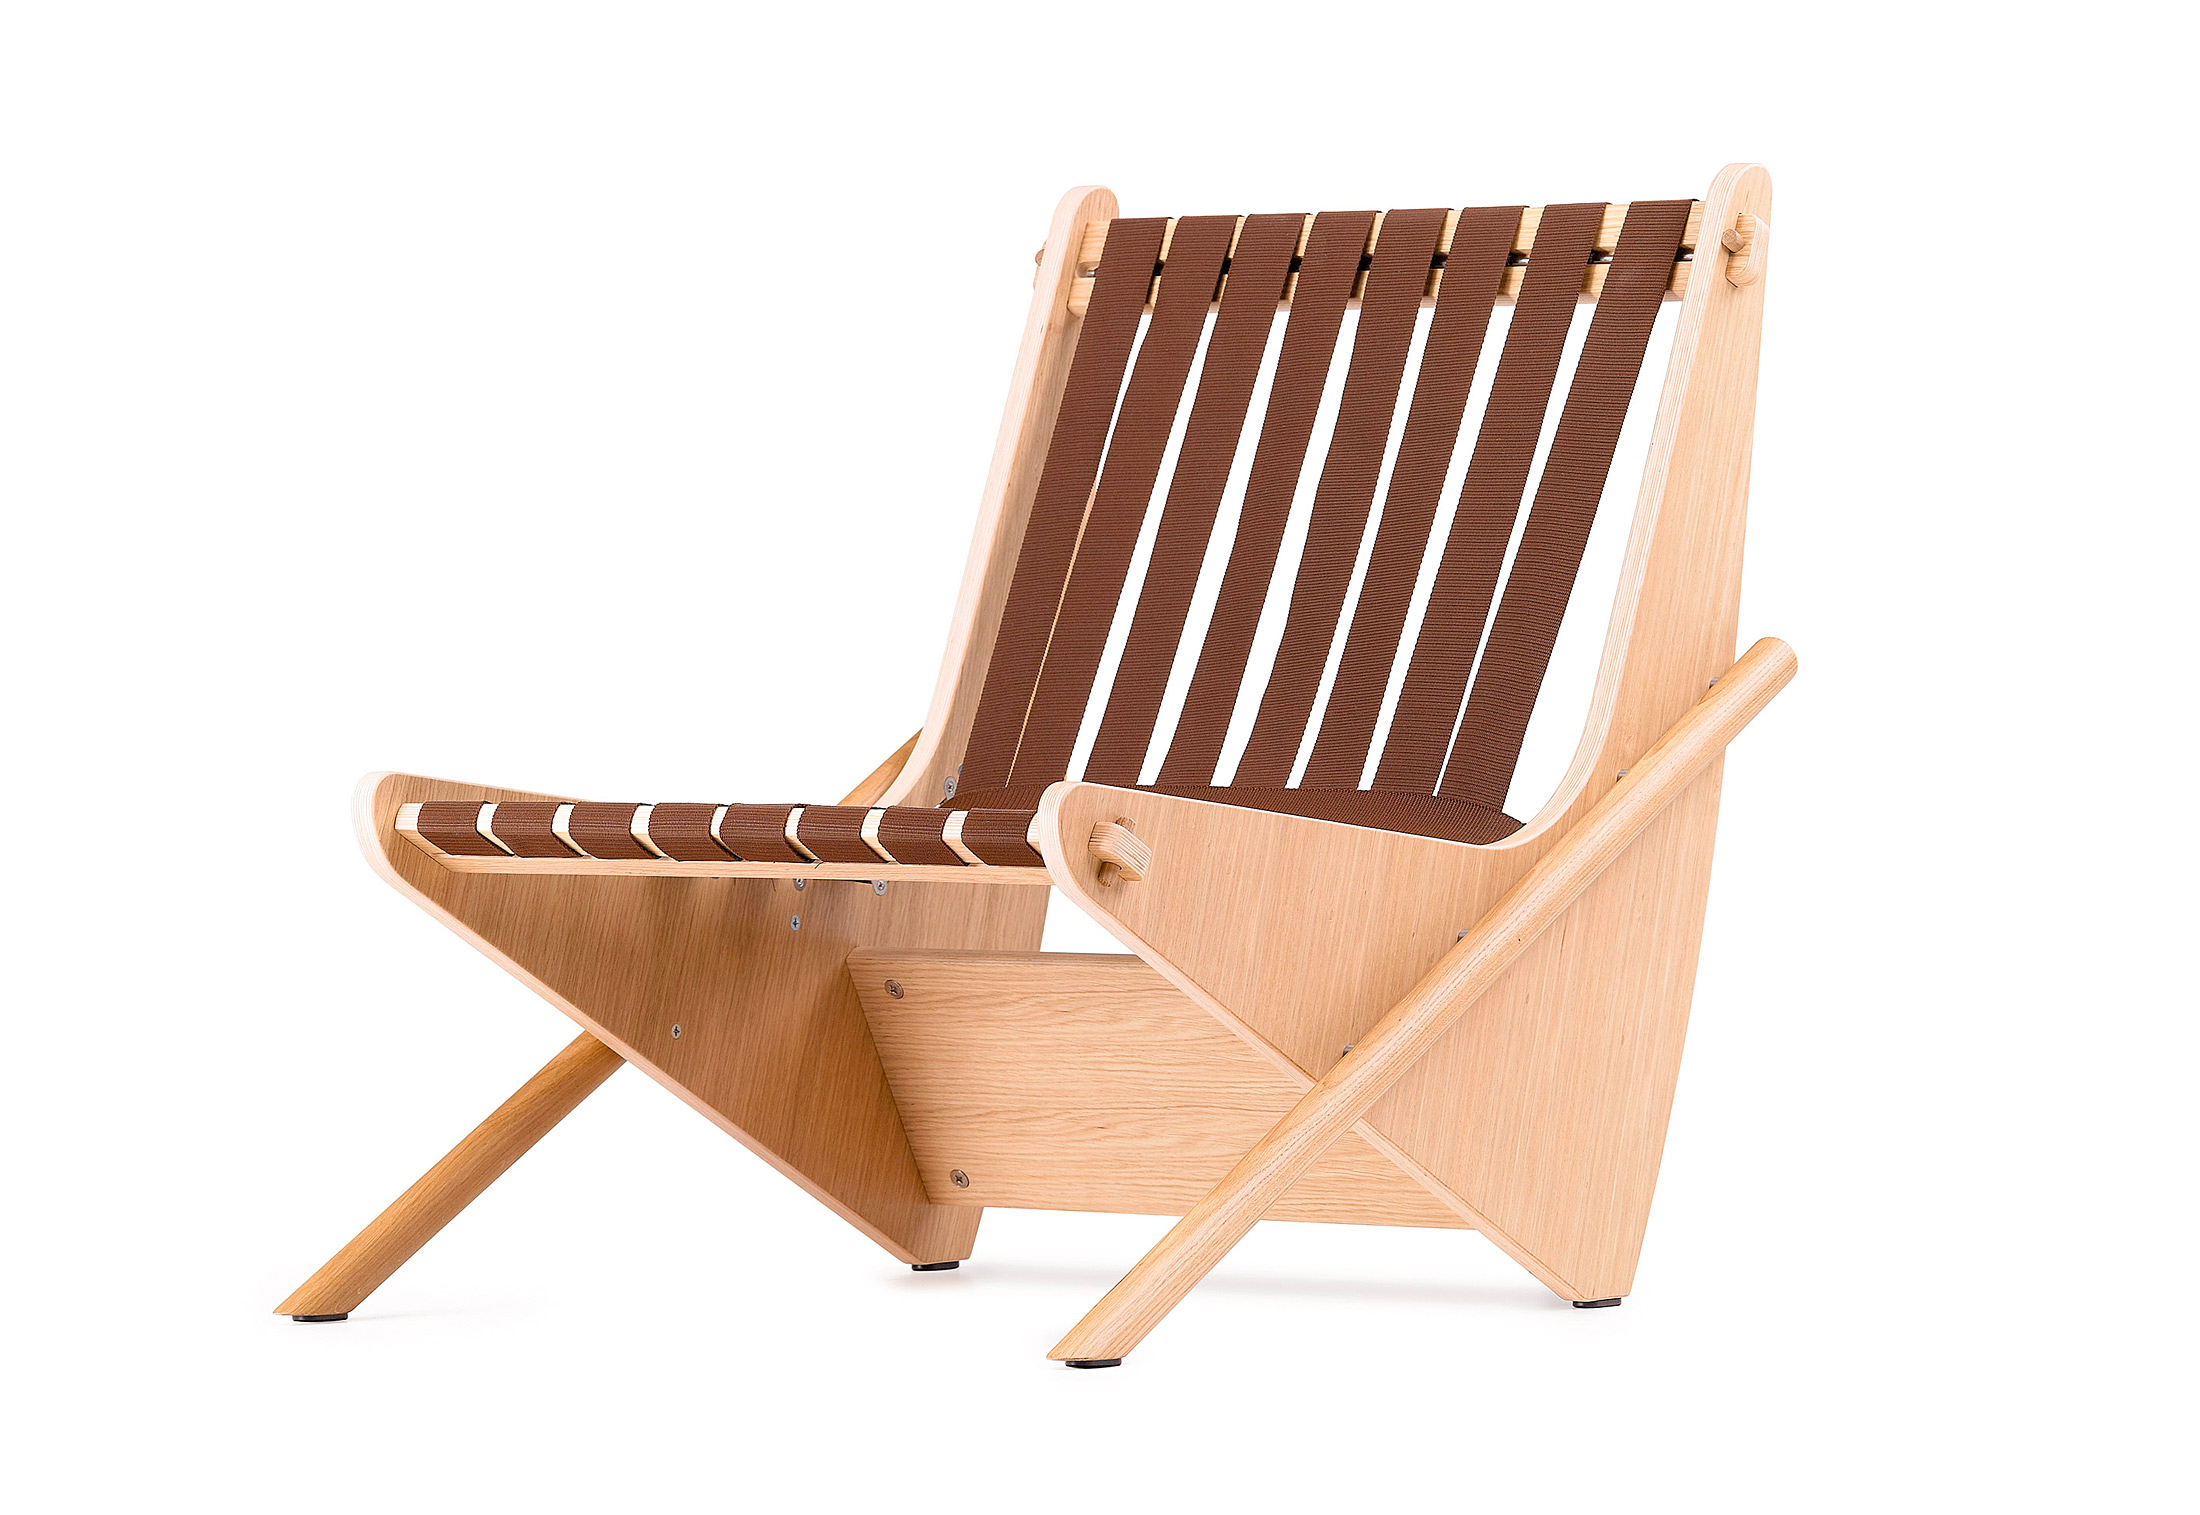 Boomerang Chair By Neutra By Vs Stylepark